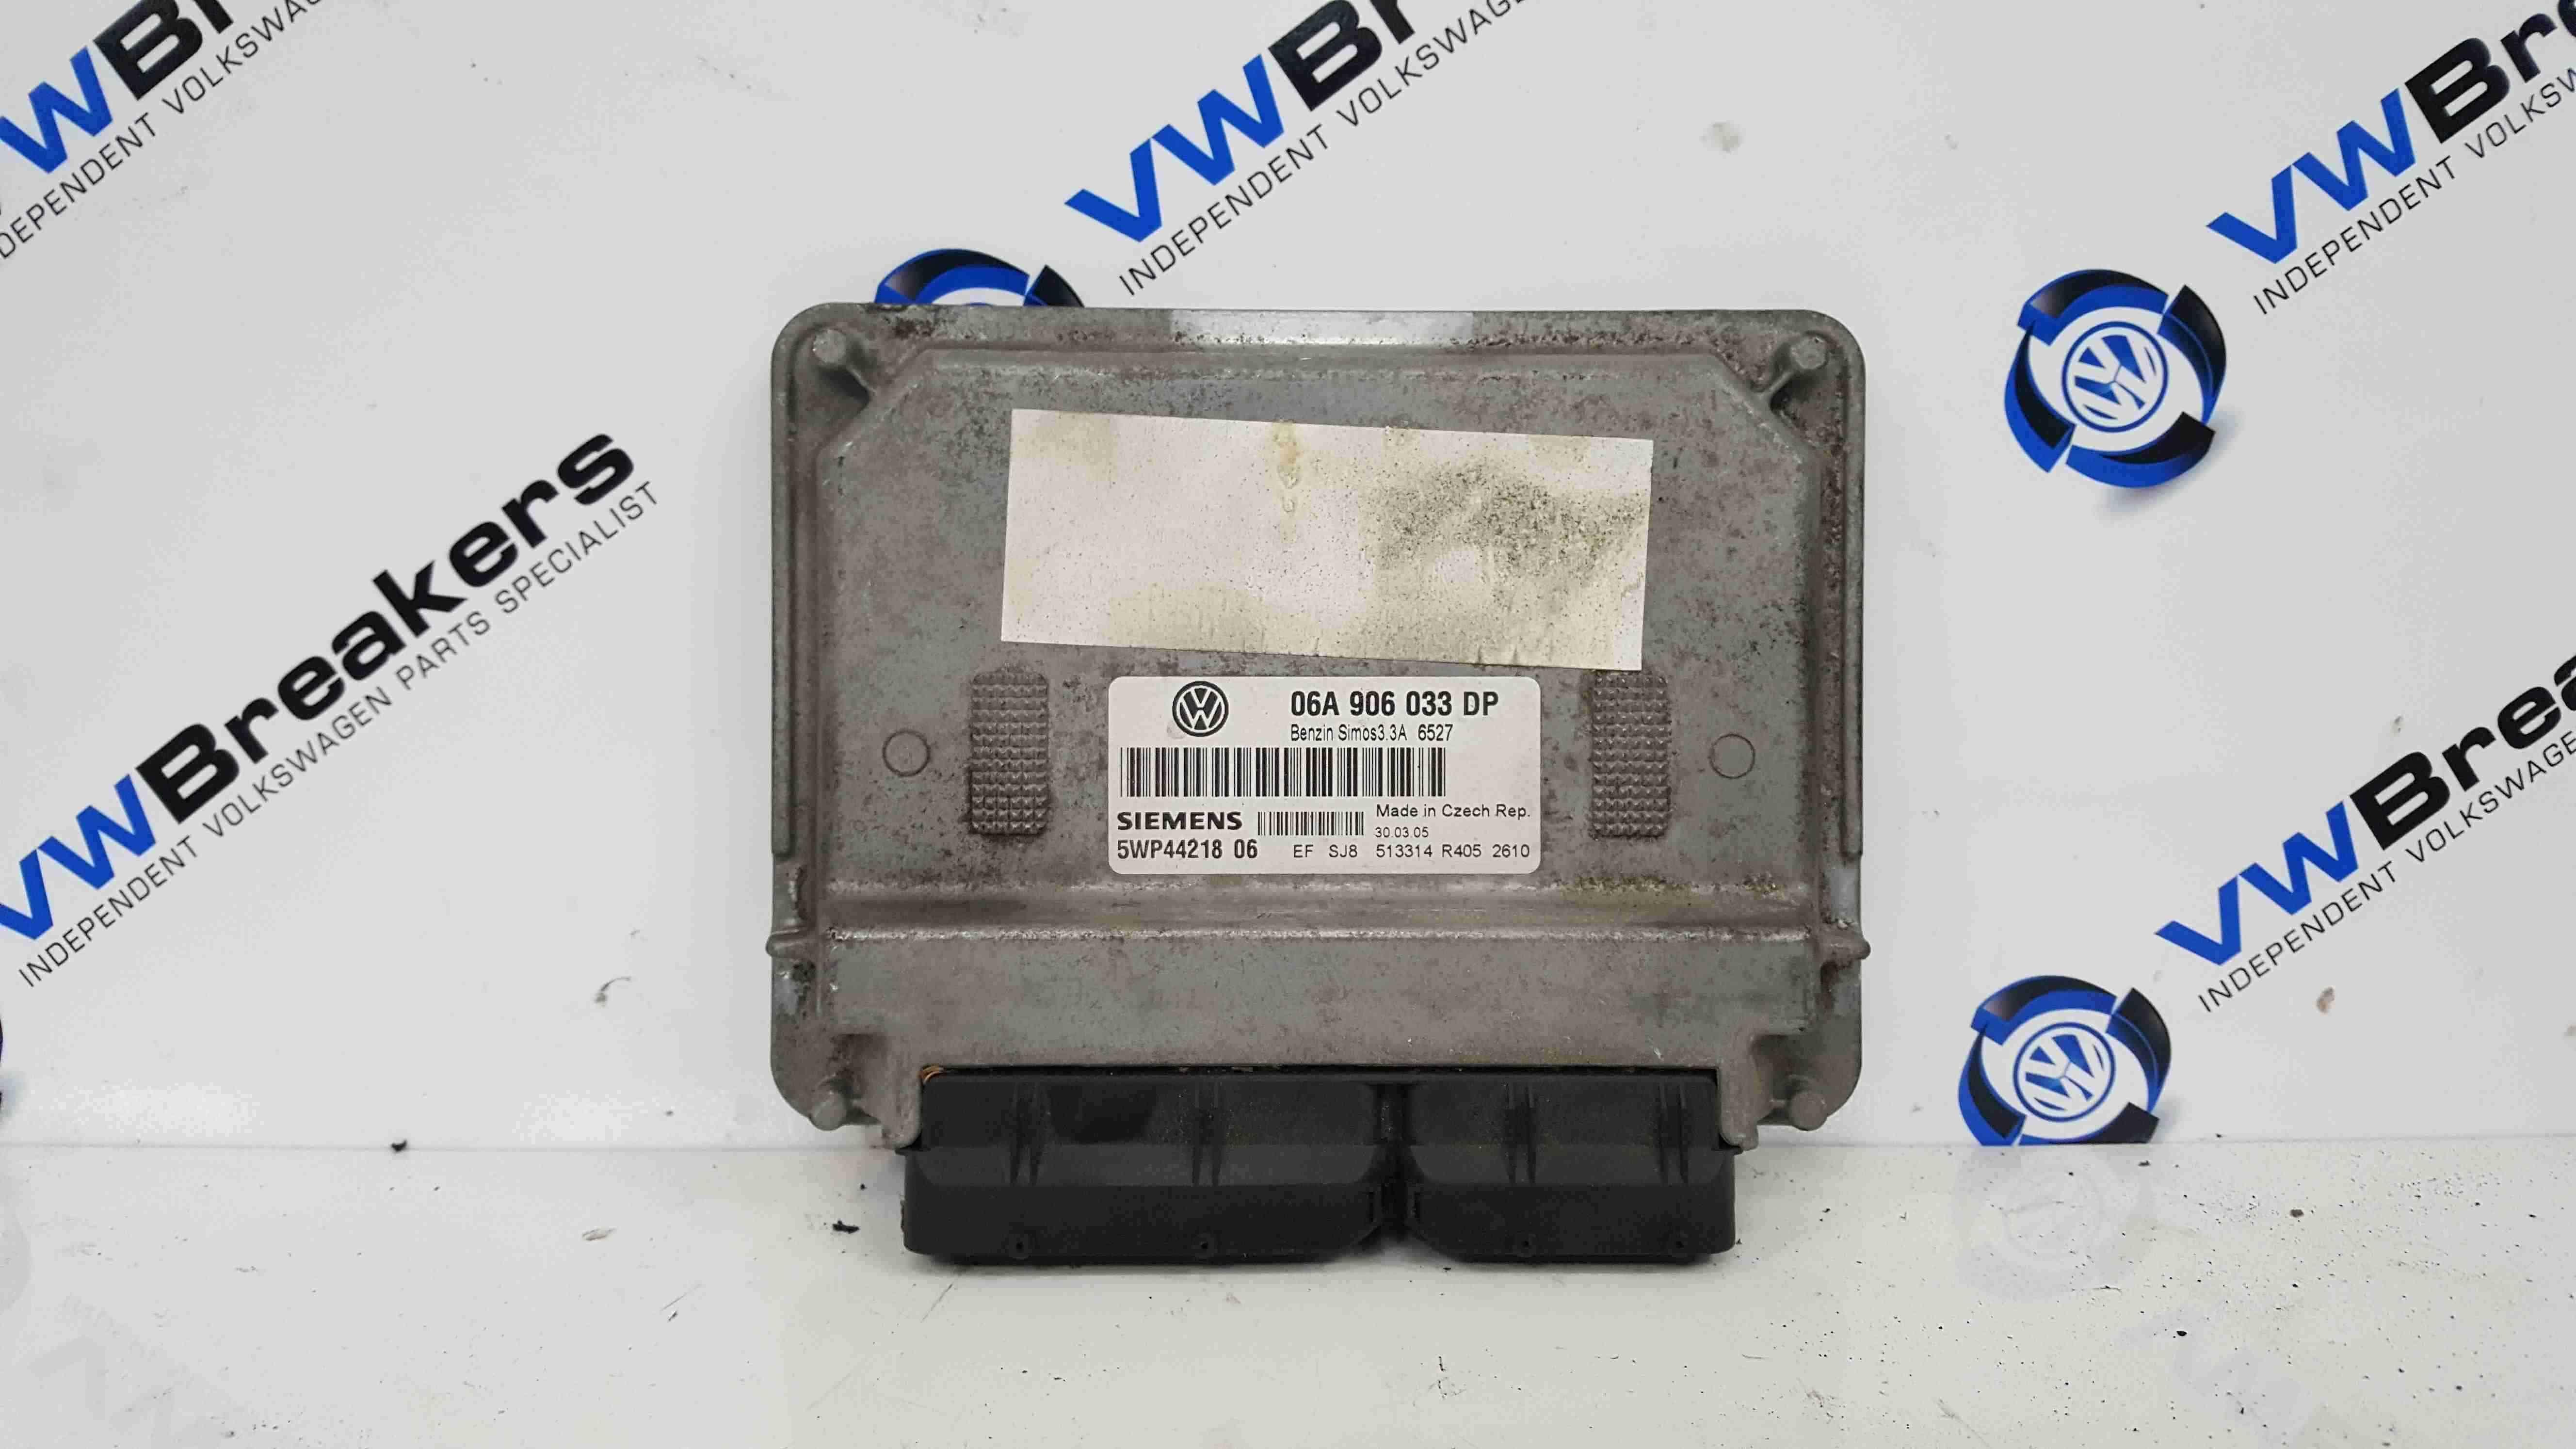 Volkswagen Beetle 1999-2006 1.6 Engine Control Unit ECU Module 06A906033DP